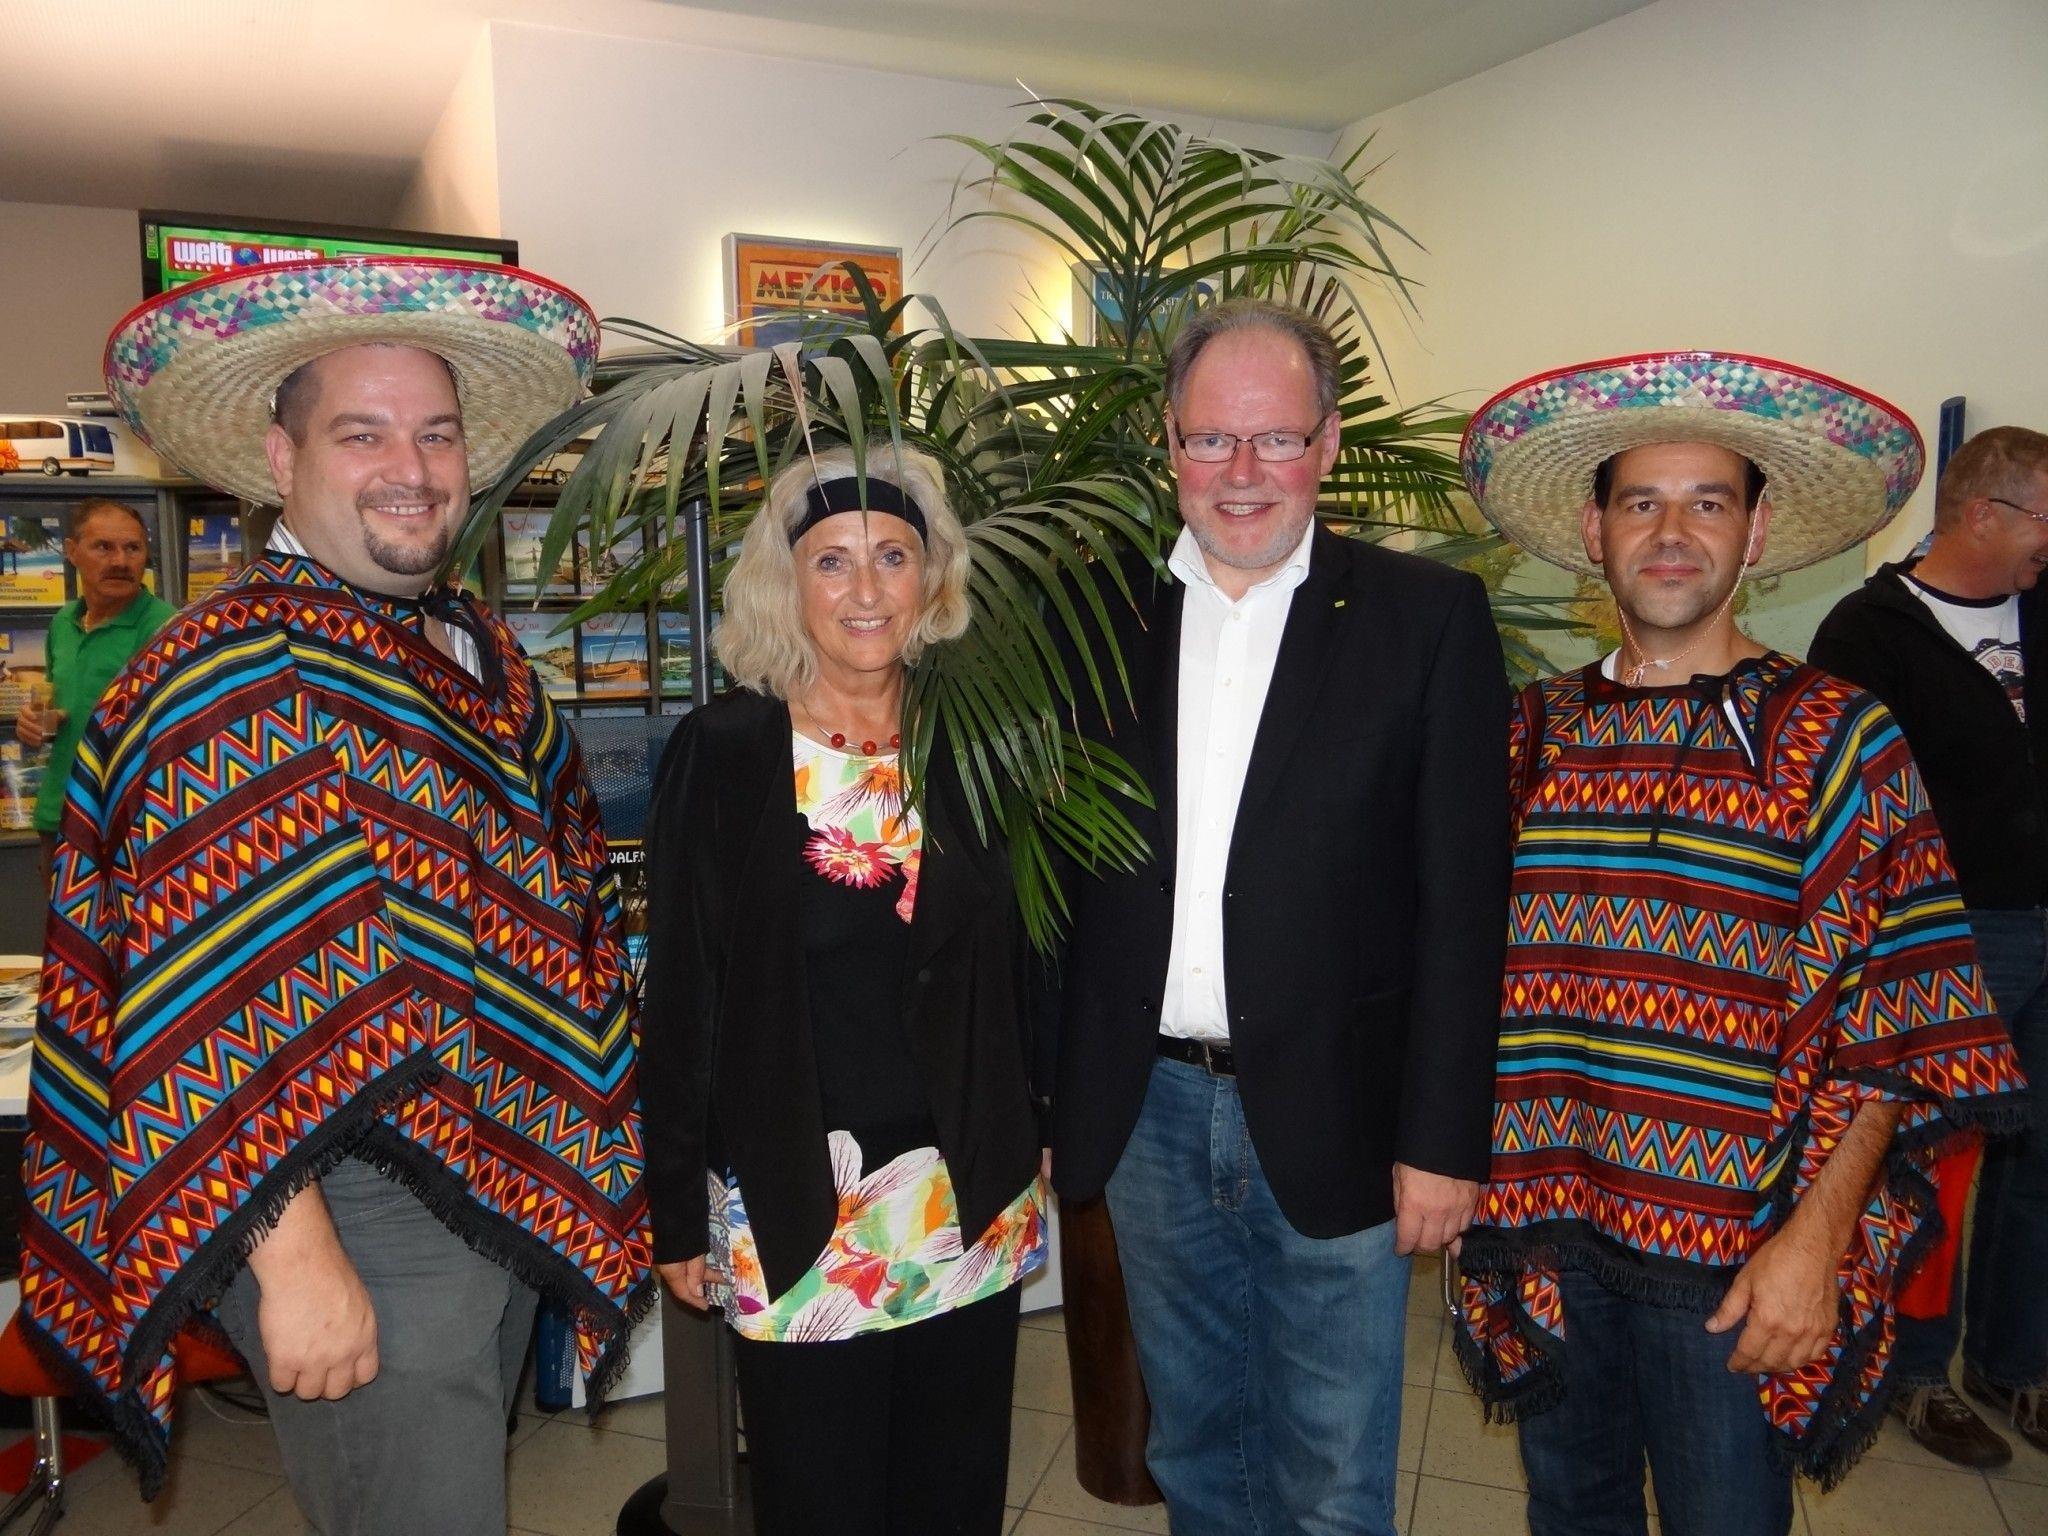 """Viva la Mexico"" hieße es am Freitag bei Loacker Tours in Götzis (v.l.) Ralph Loacker, Petra Ludescher, Bgm. Werner Huber & Klaus Böckle"